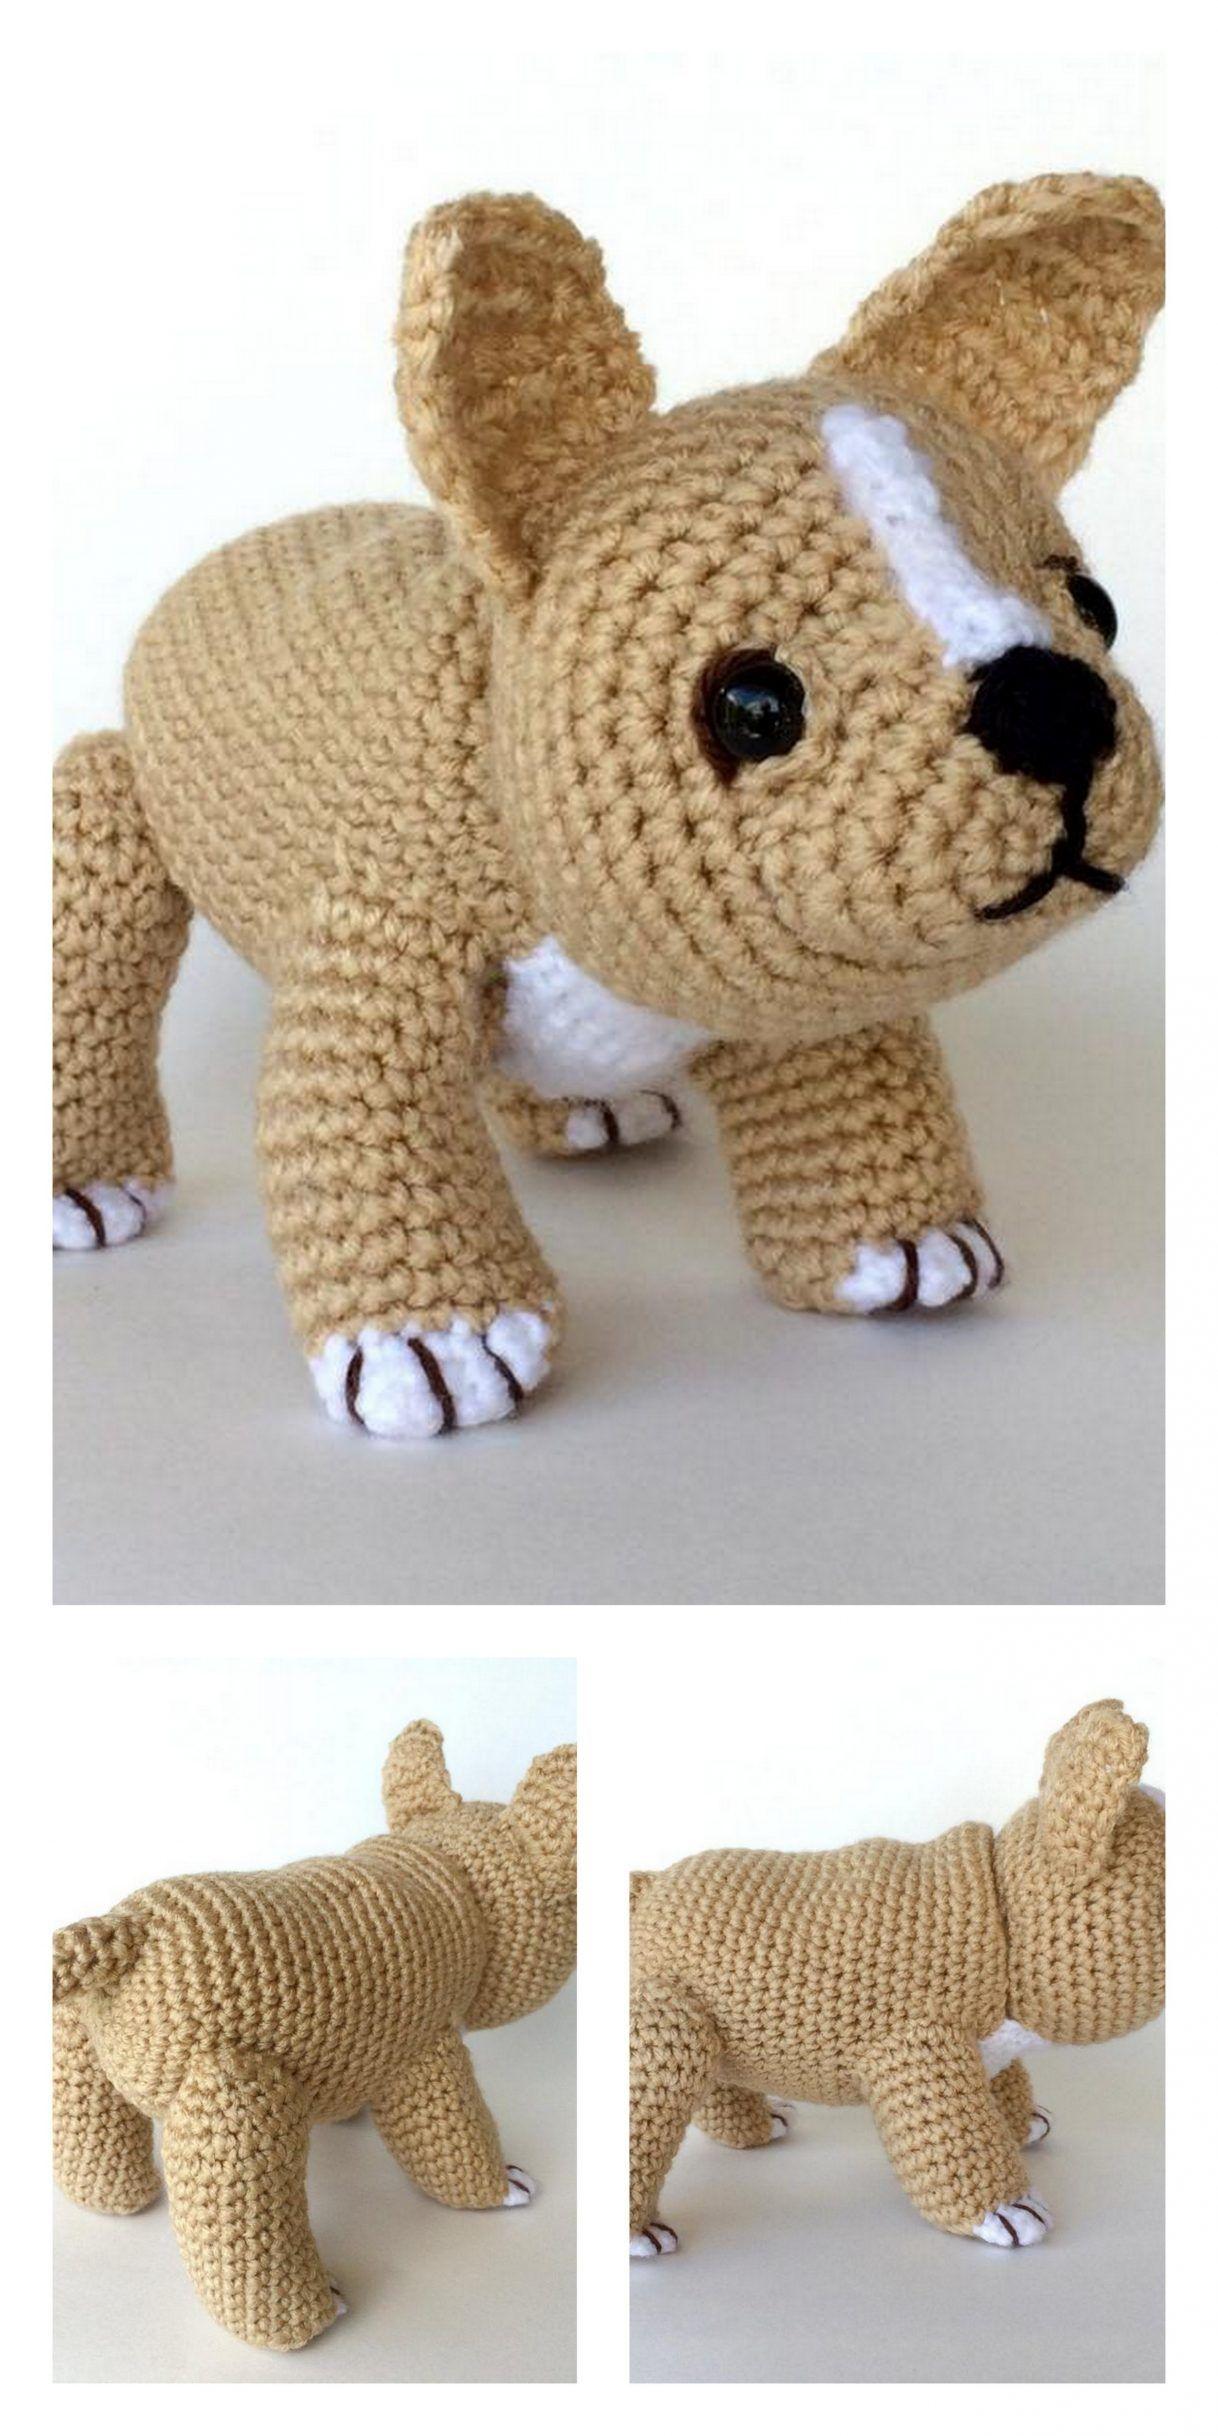 Corgi Dog Amigurumi - Free Crochet Pattern | Crochet patterns ... | 2436x1218